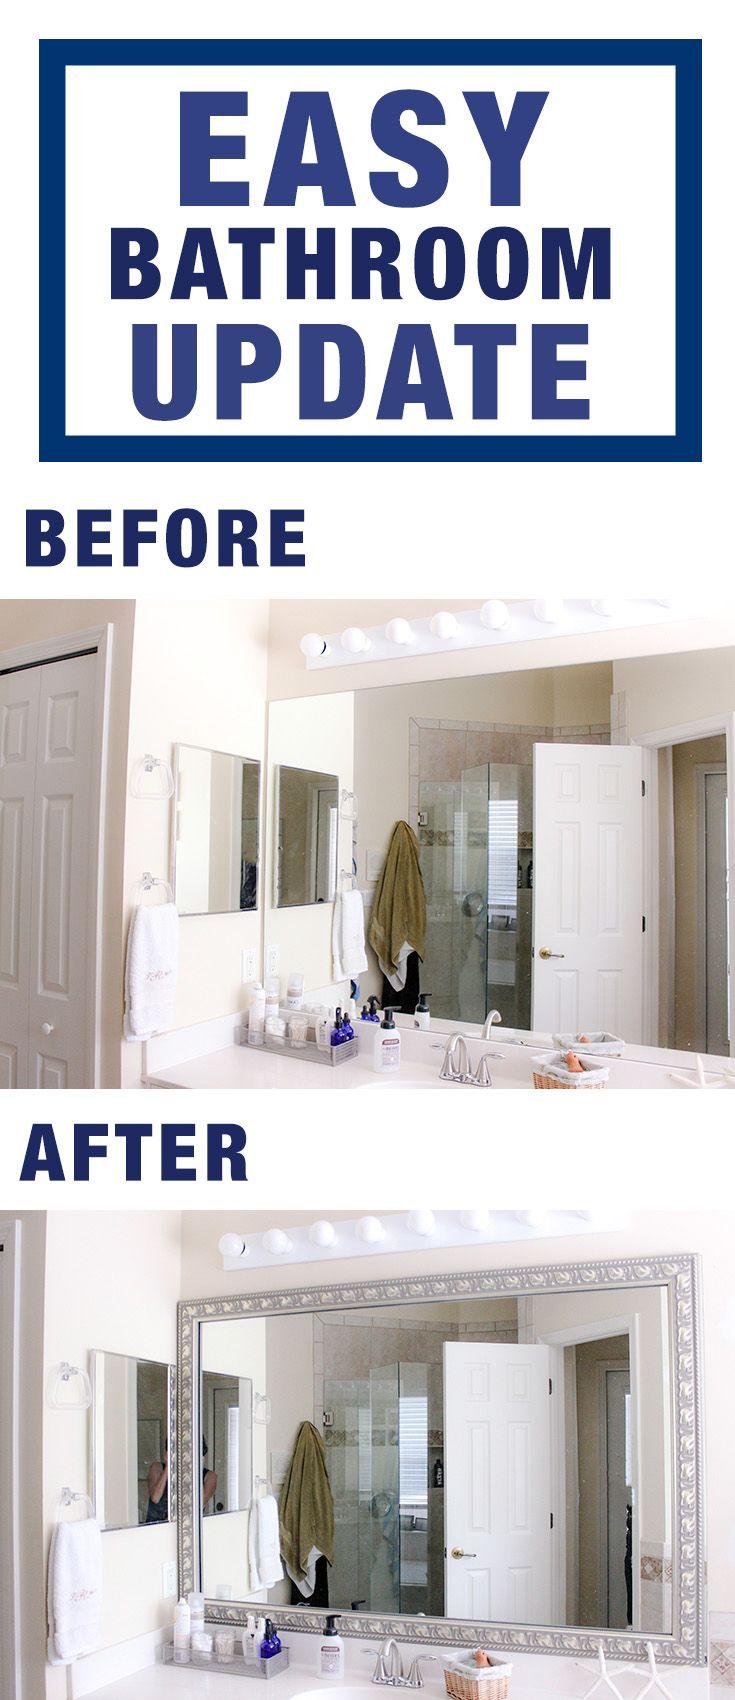 Easy Bathroom Update With DIY Mirror Frame Kit From Frame My Mirror - Easy bathroom updates